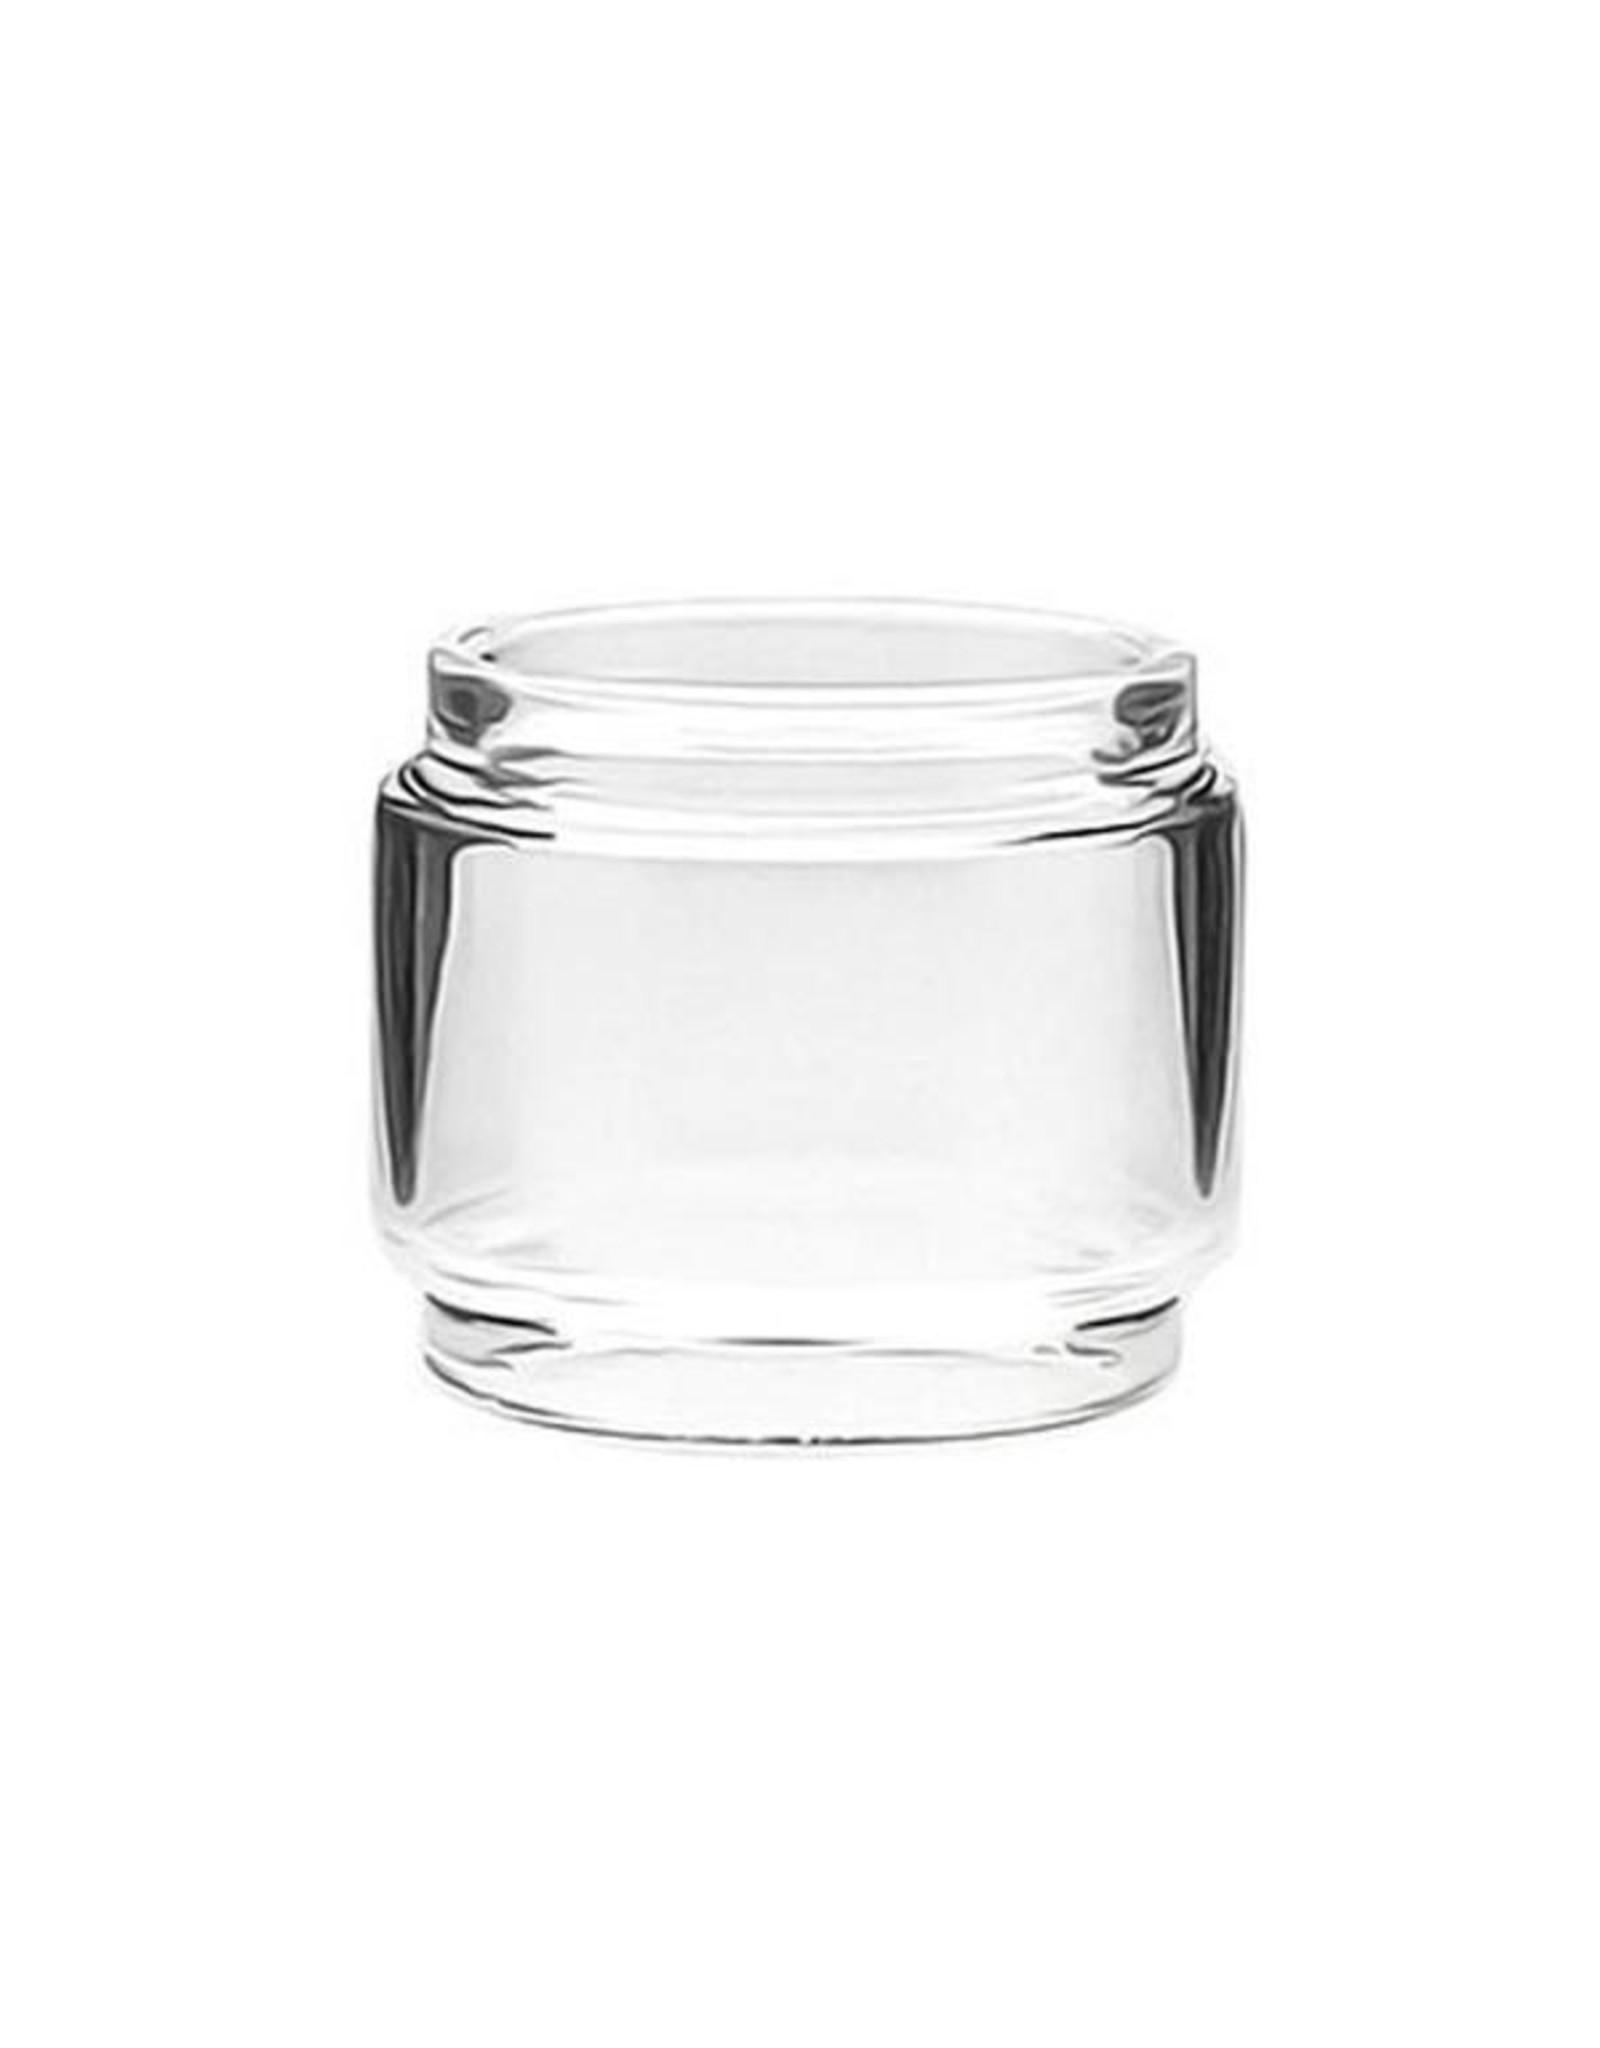 Uwell Uwell: Valyrian Glass